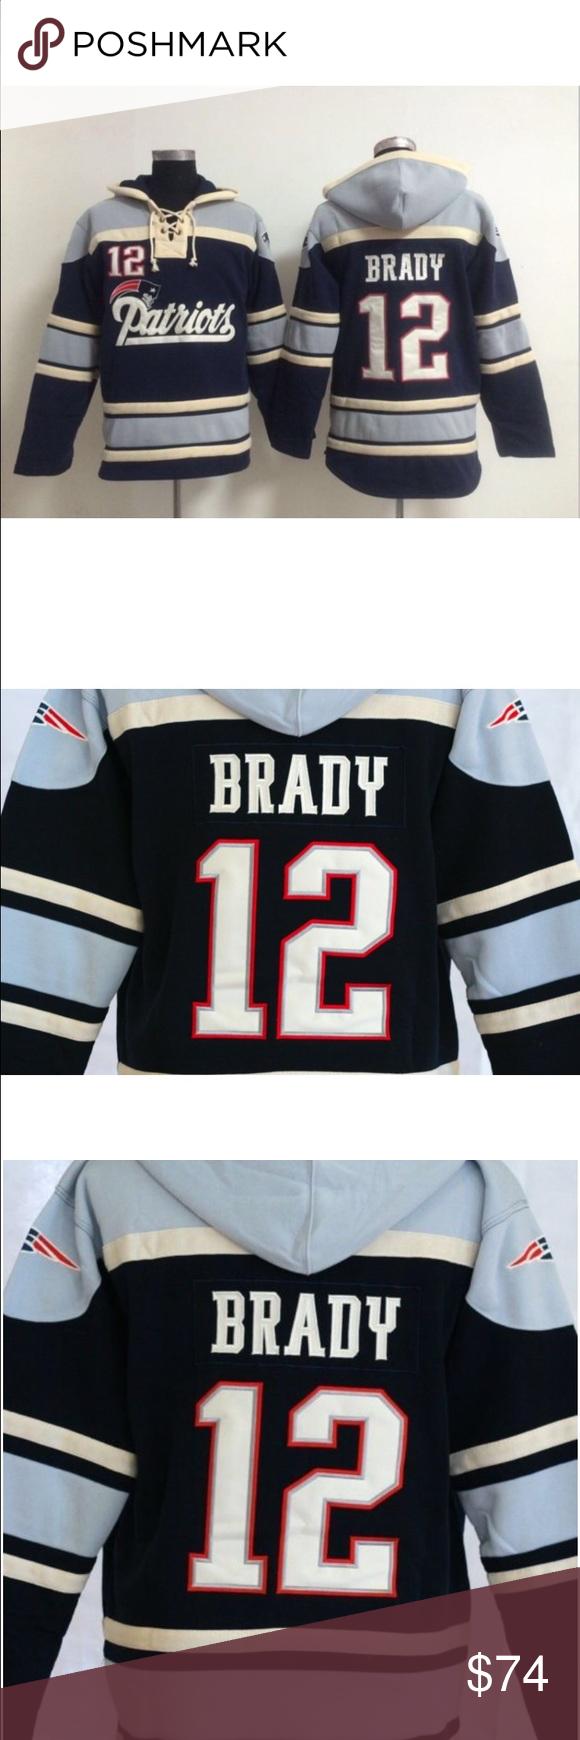 tom brady embroidered jersey